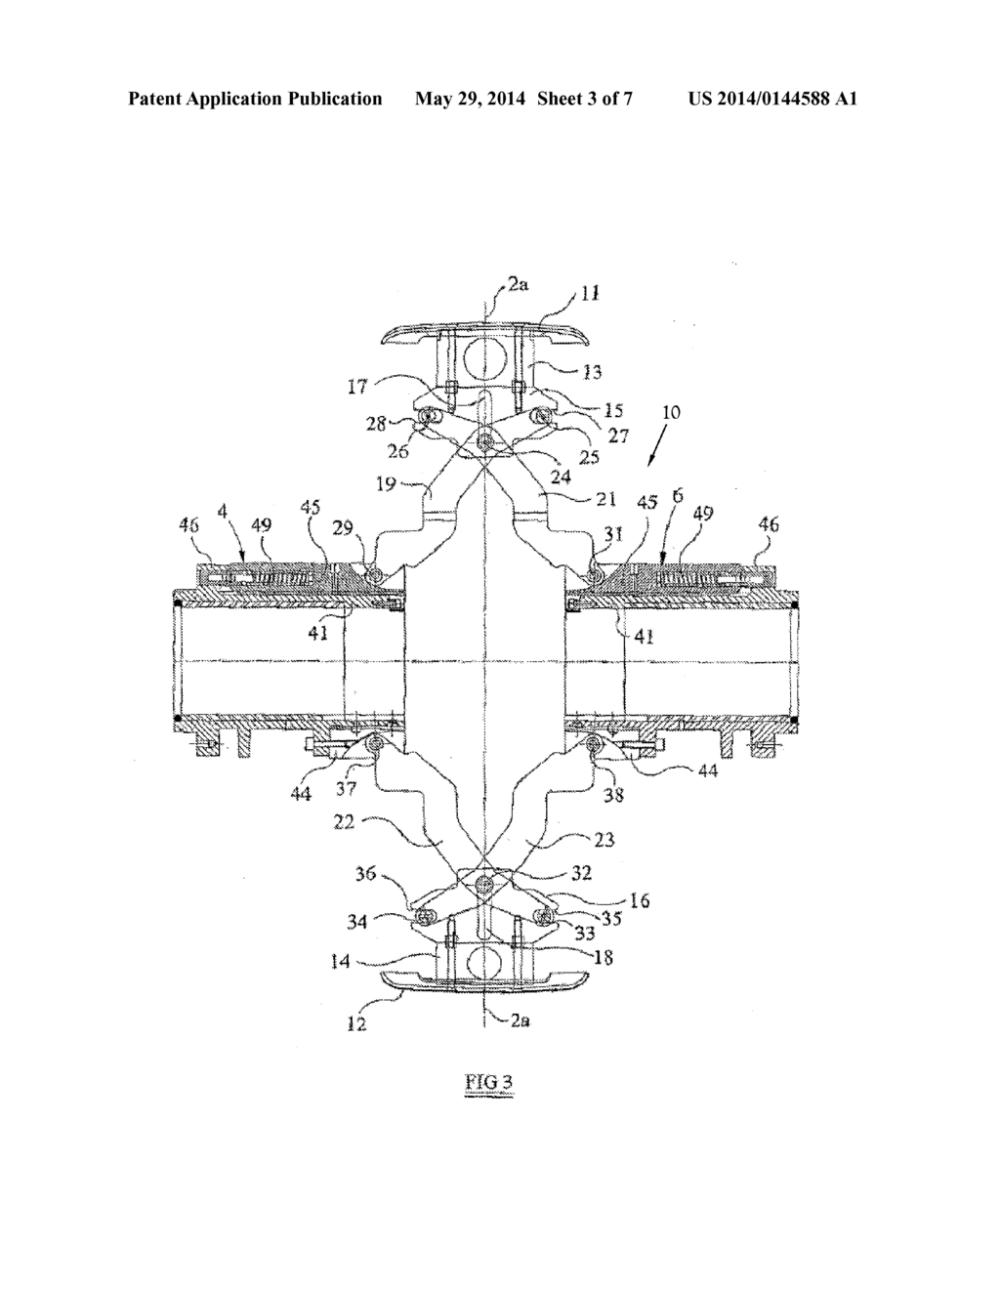 medium resolution of tire building drum having sequenced segment expansion diagram schematic and image 04